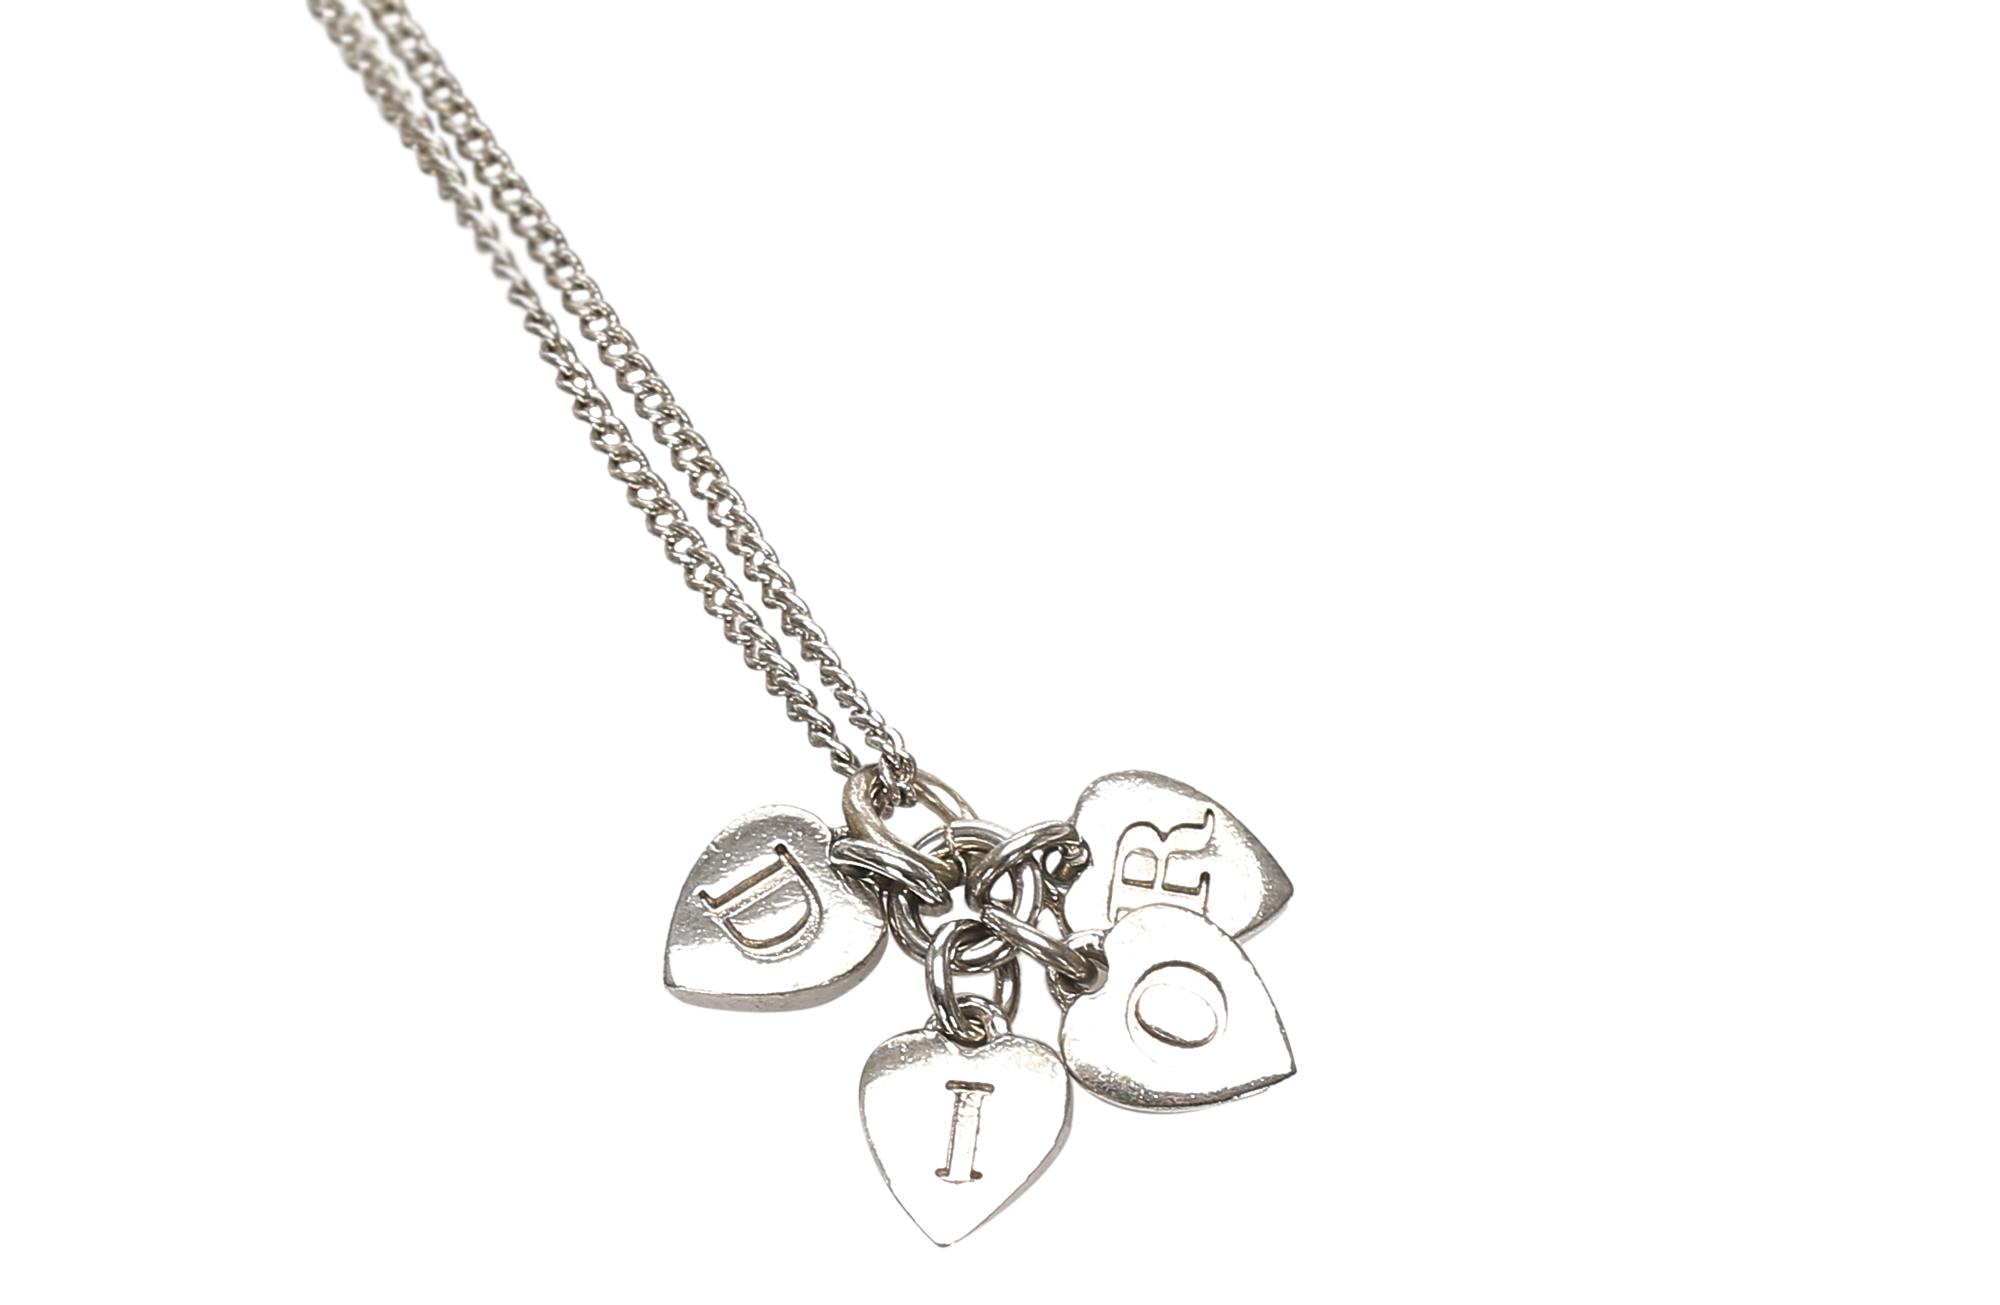 Heart Logo Pendant Necklace